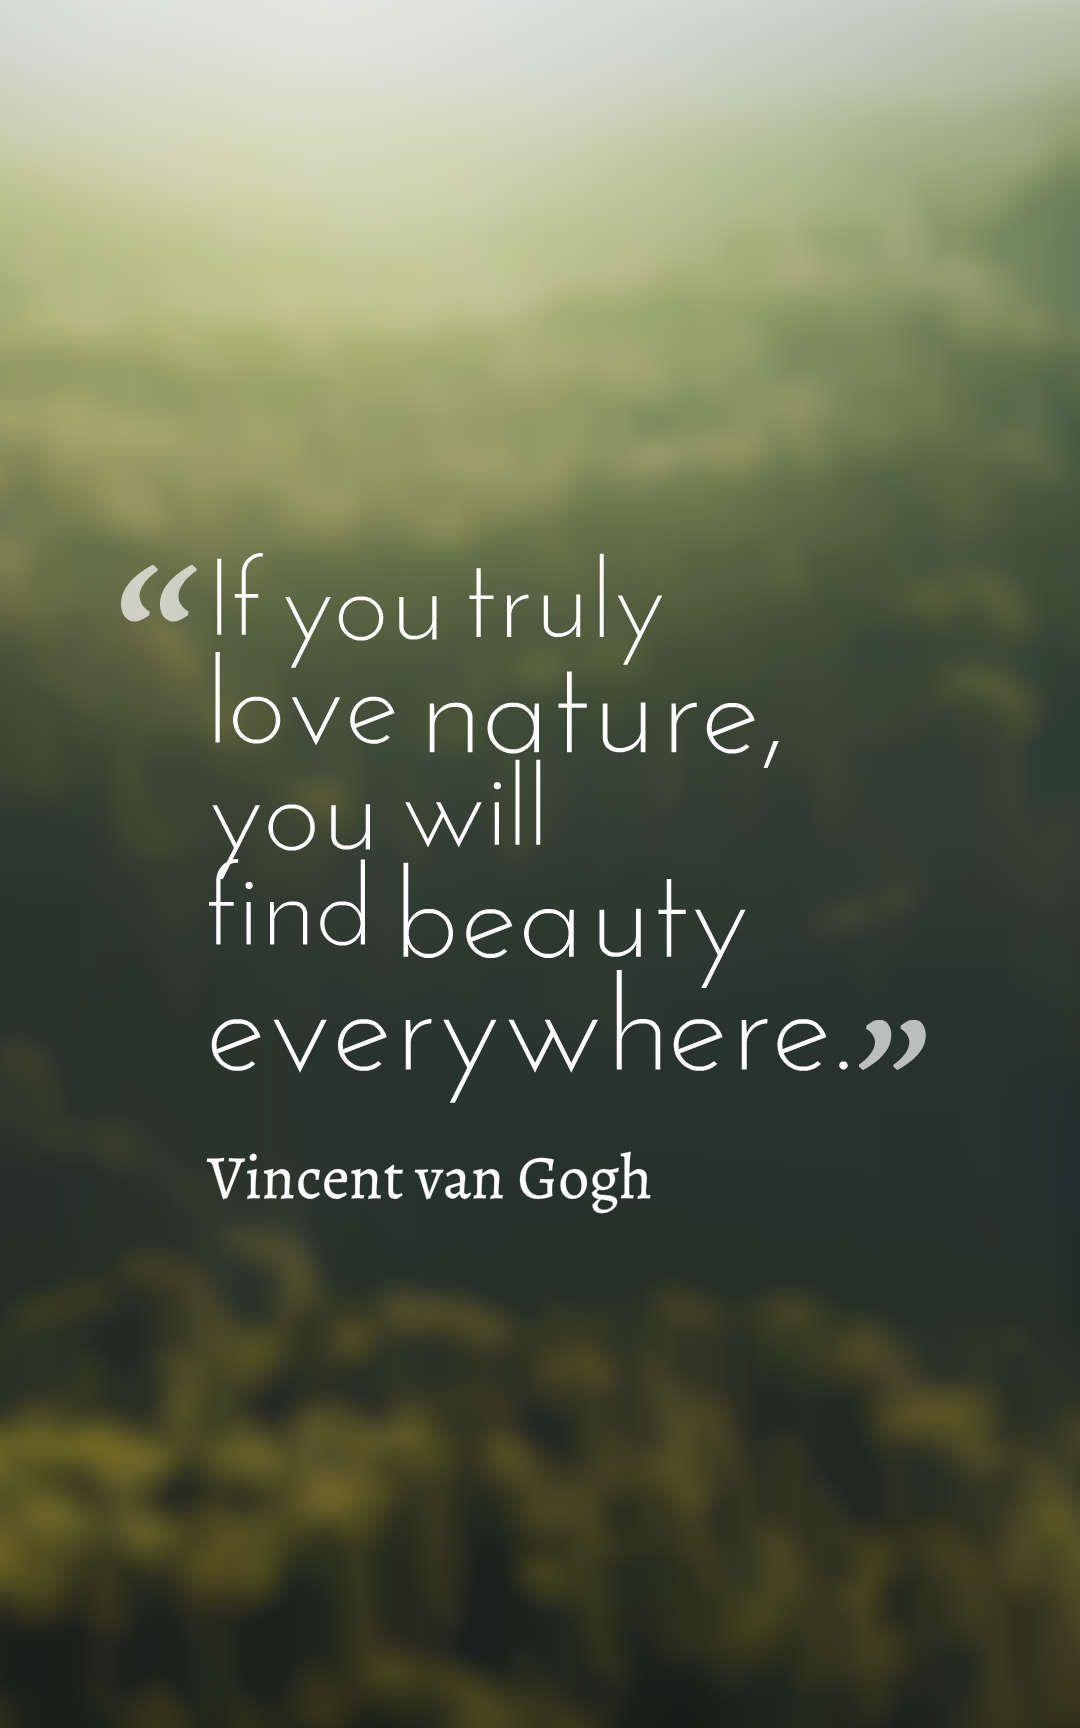 Love Nature Beauty Everywhere Vincent Van Gogh Skin Natural Healthy Art Nulife Skincare Nature Quotes Nature Quotes Beautiful Nature Quotes Adventure